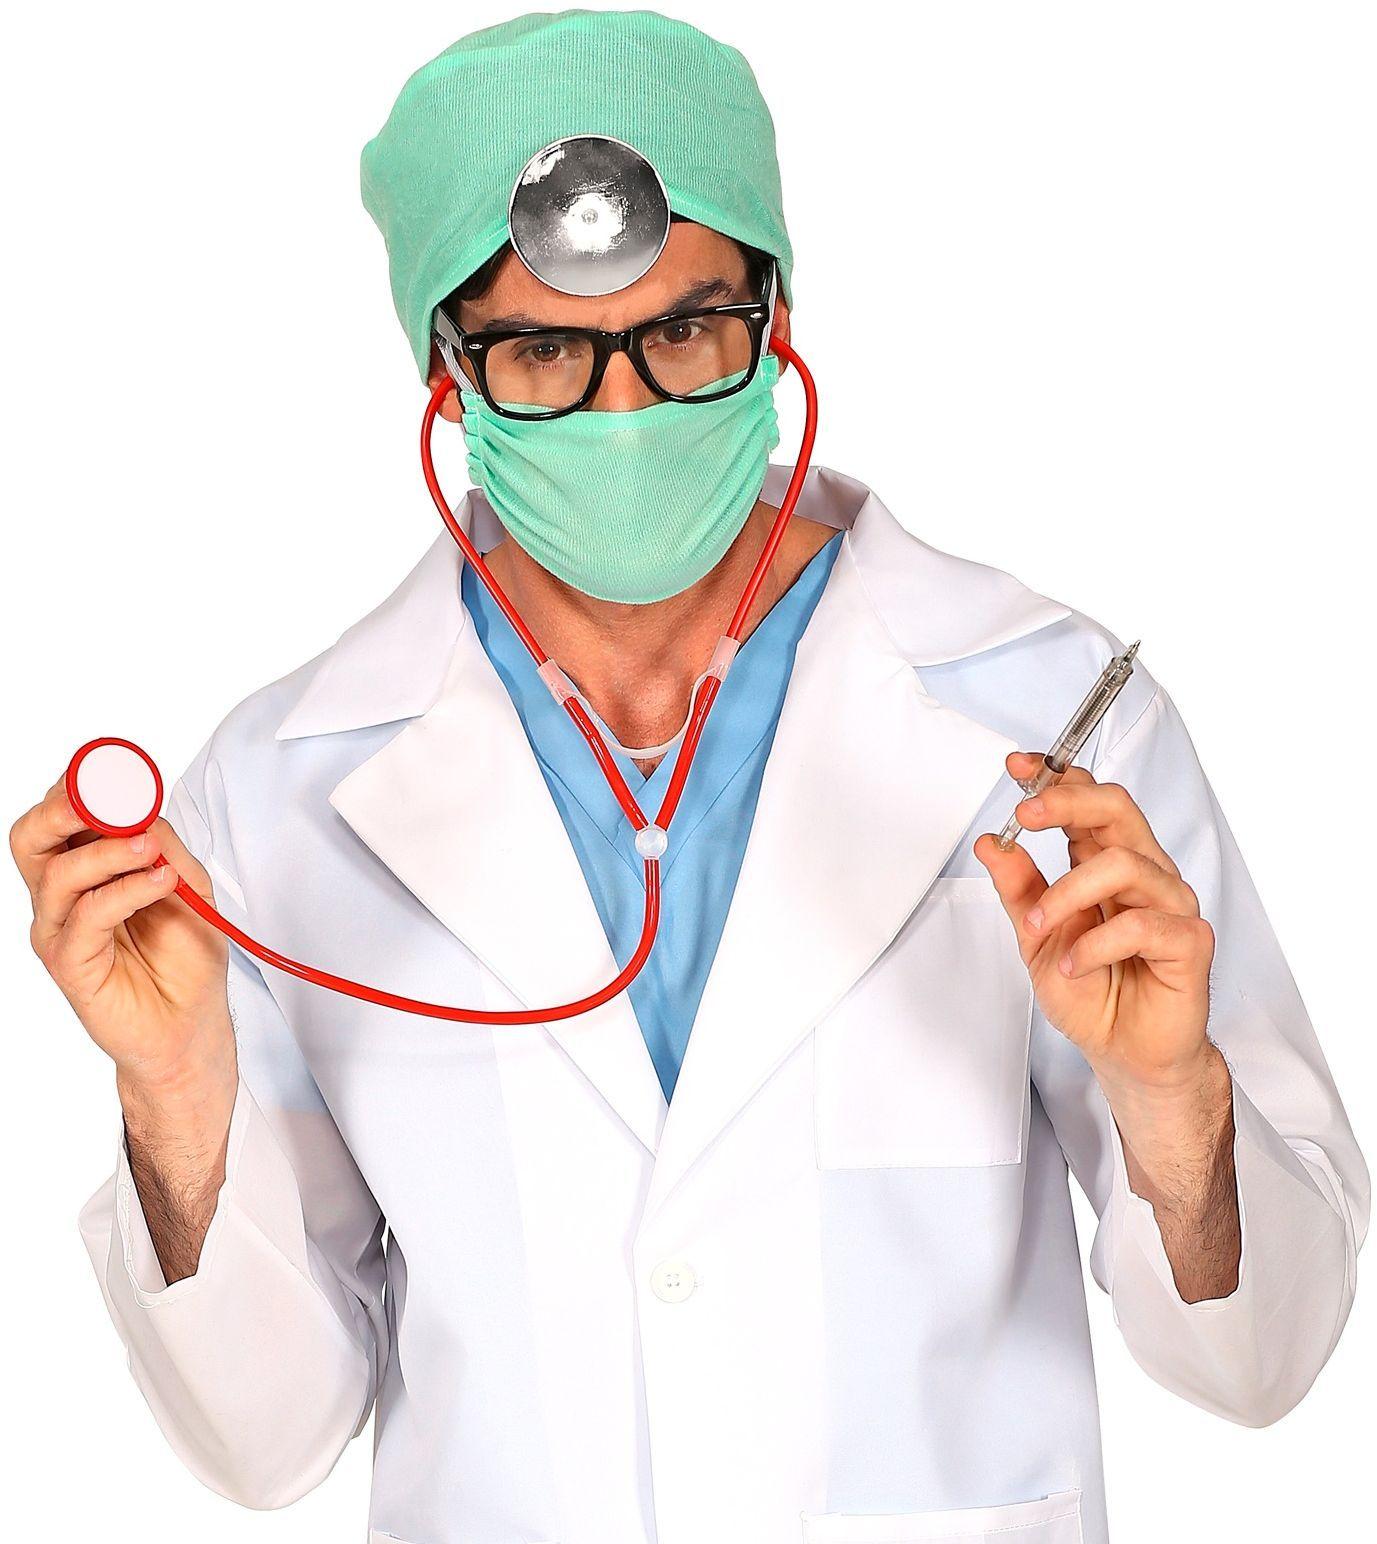 Dokter accessoires setje